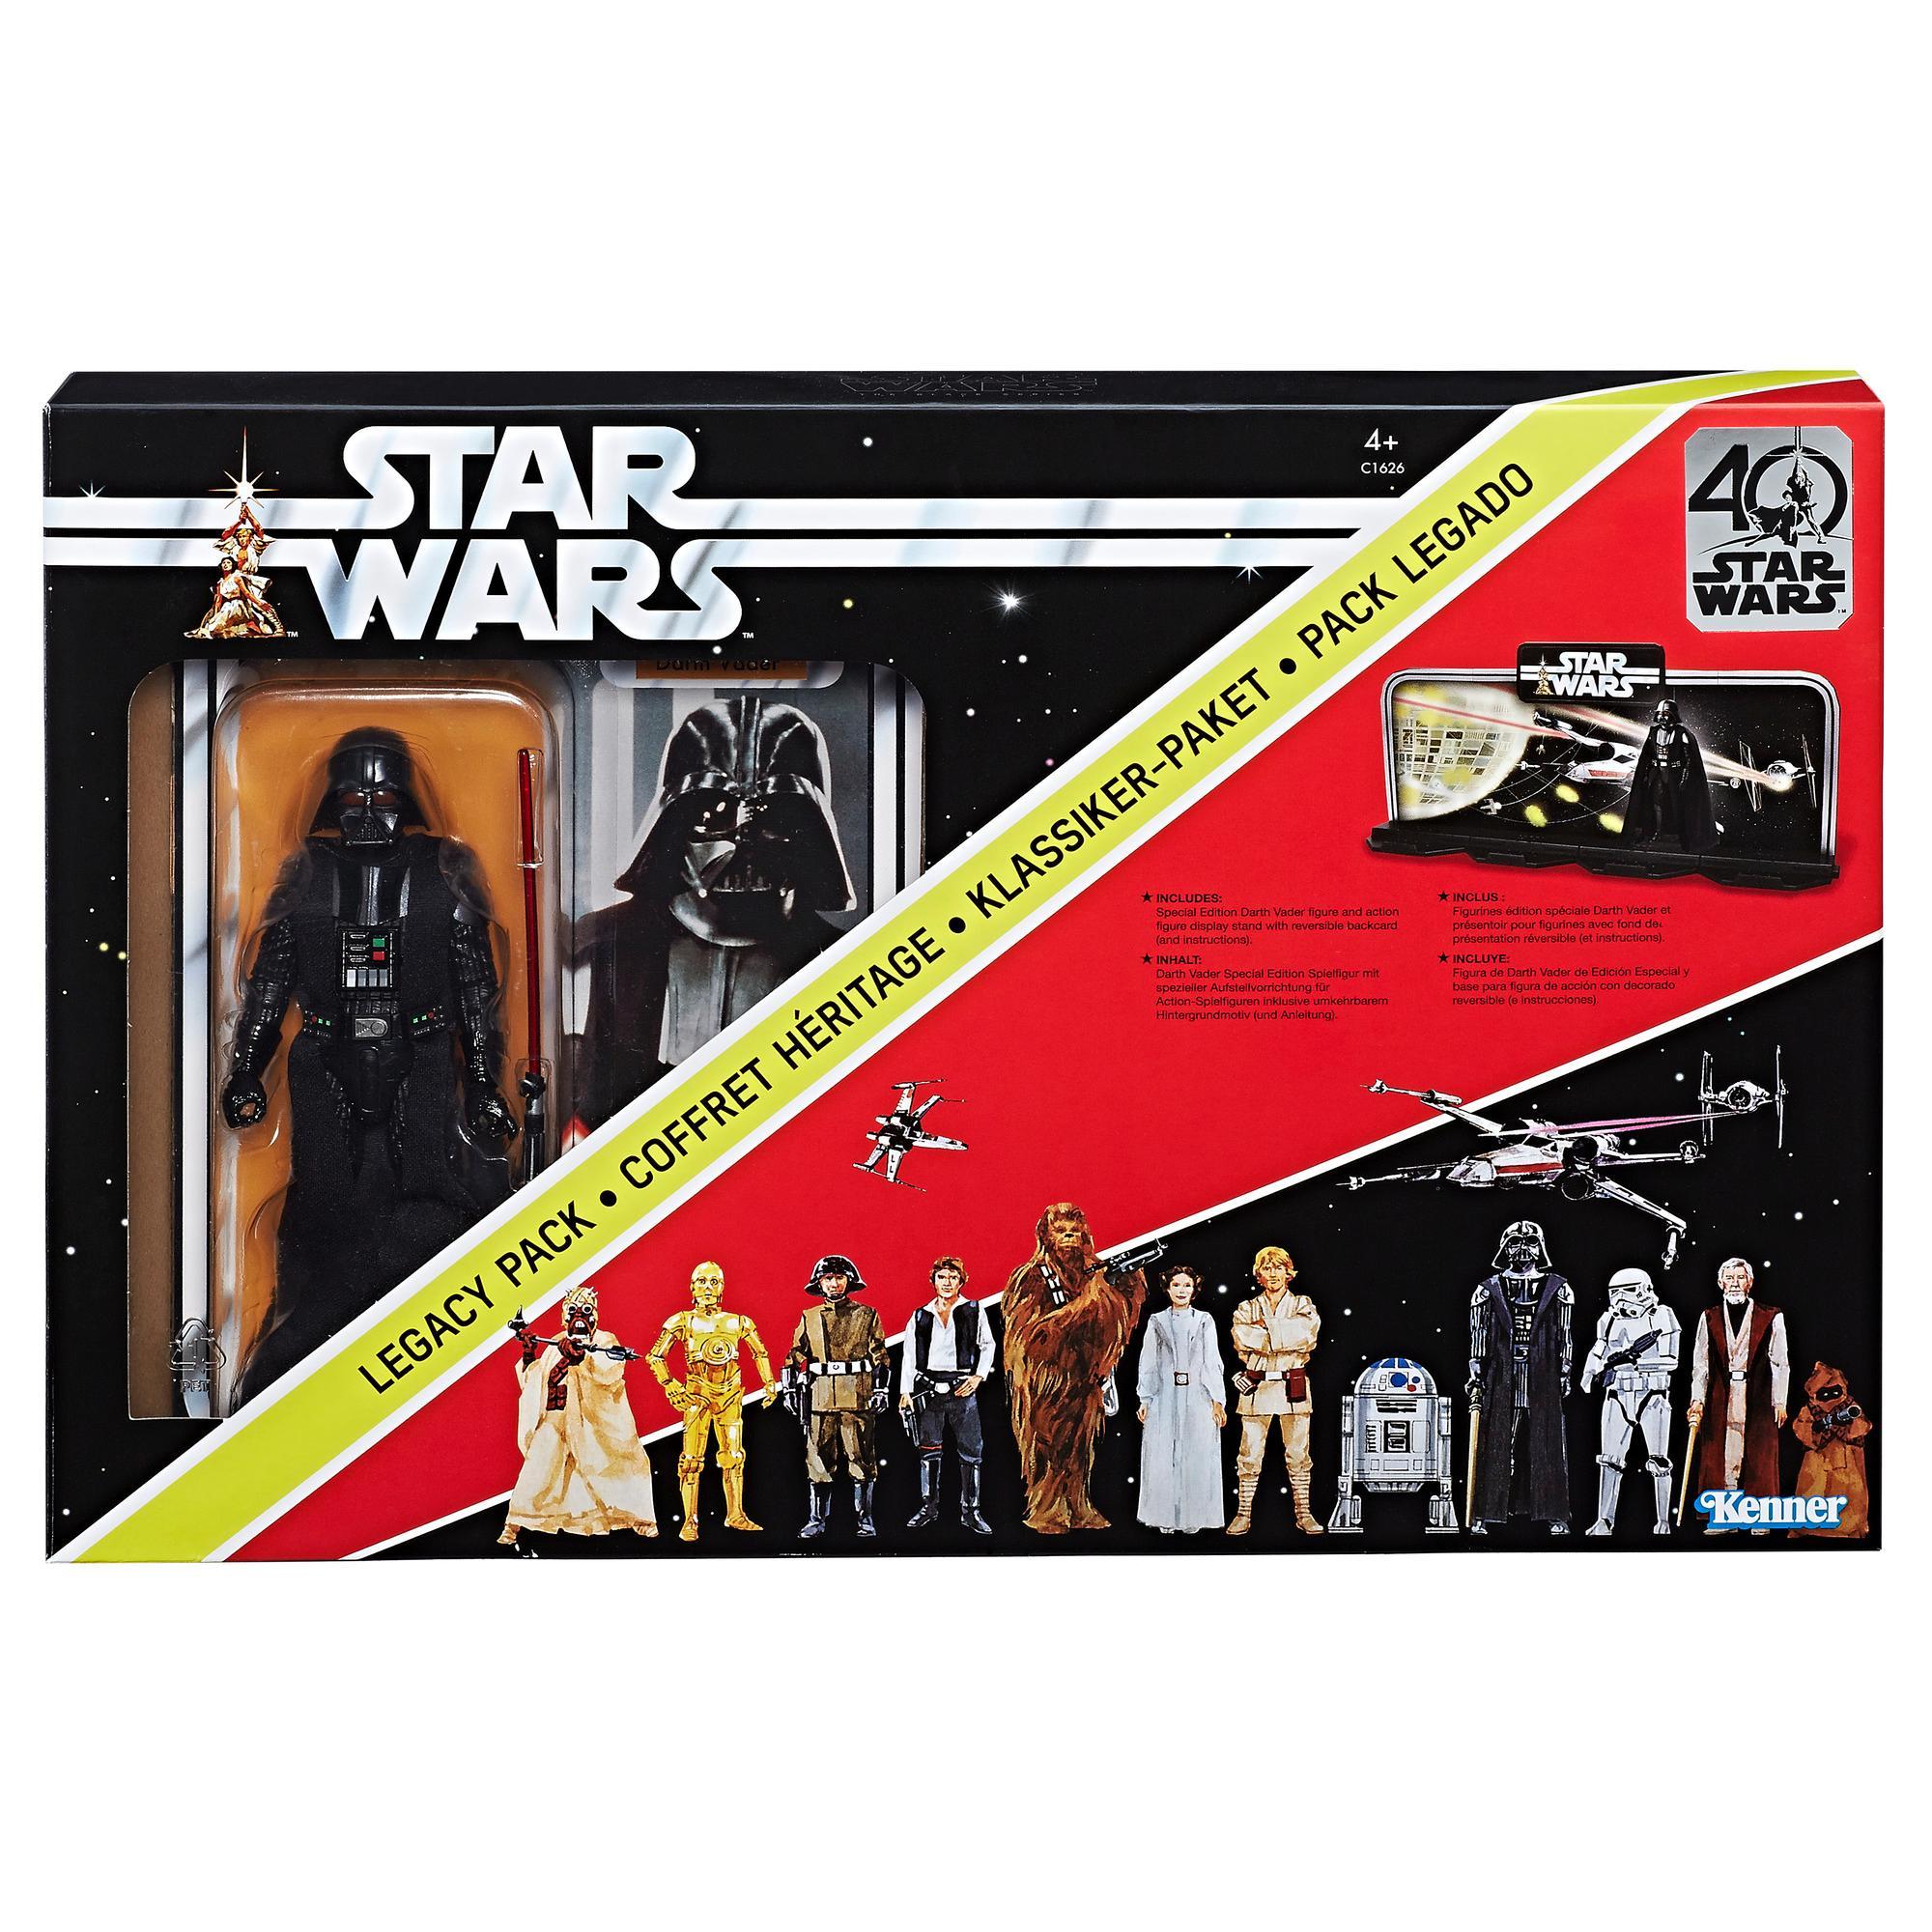 Star Wars The Black Series - Ensemble Héritage 40e Anniversaire